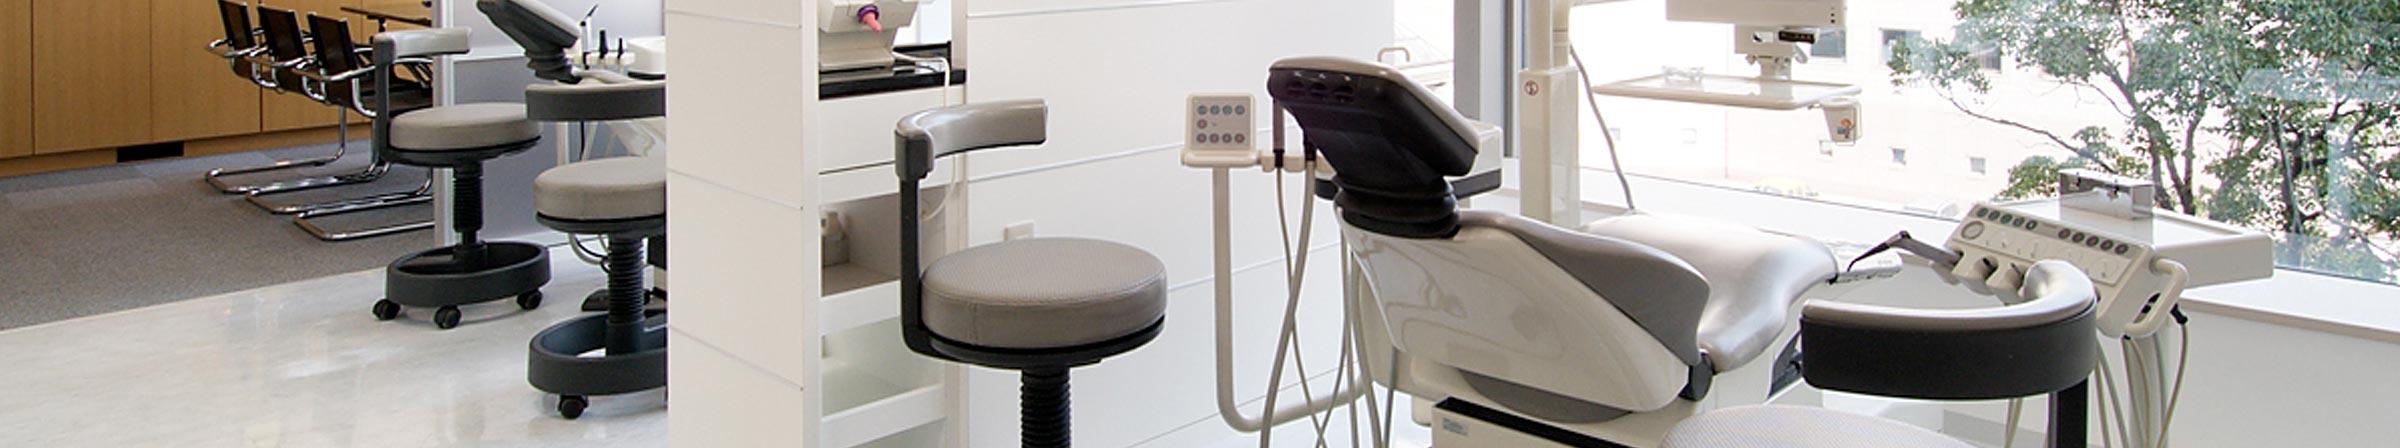 MMデンタルクリニック治療室